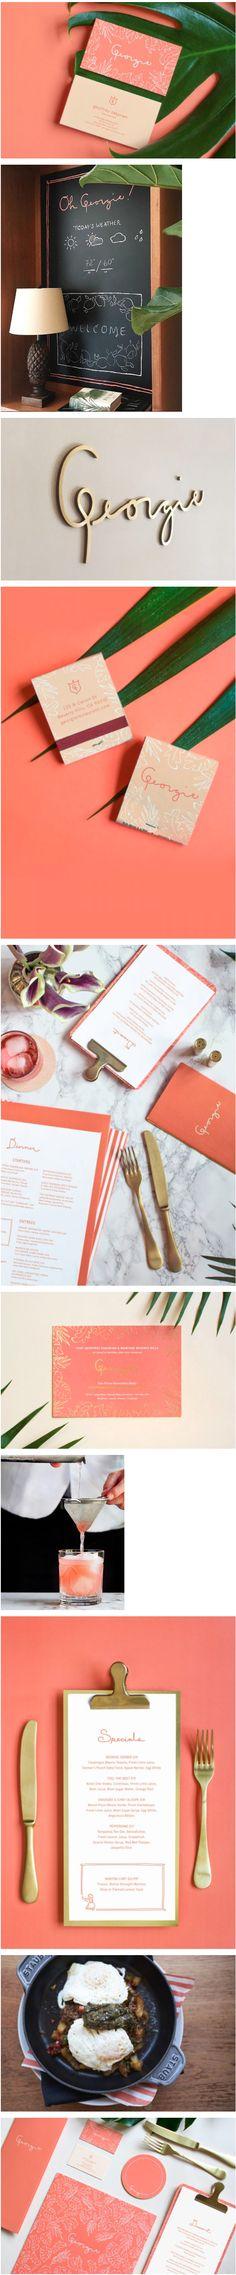 Georgie Restaurant Branding by Sandy Ley